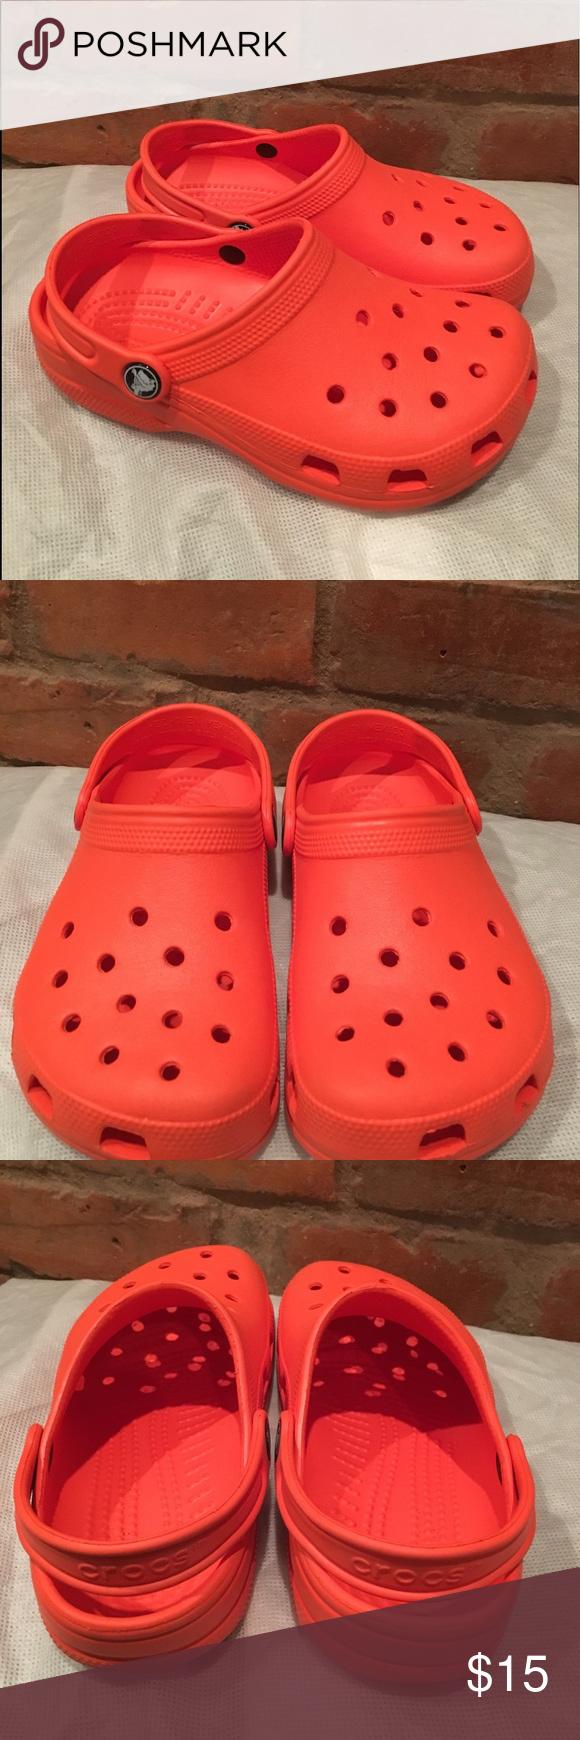 Crocs Kids size 2 girls size 4 These